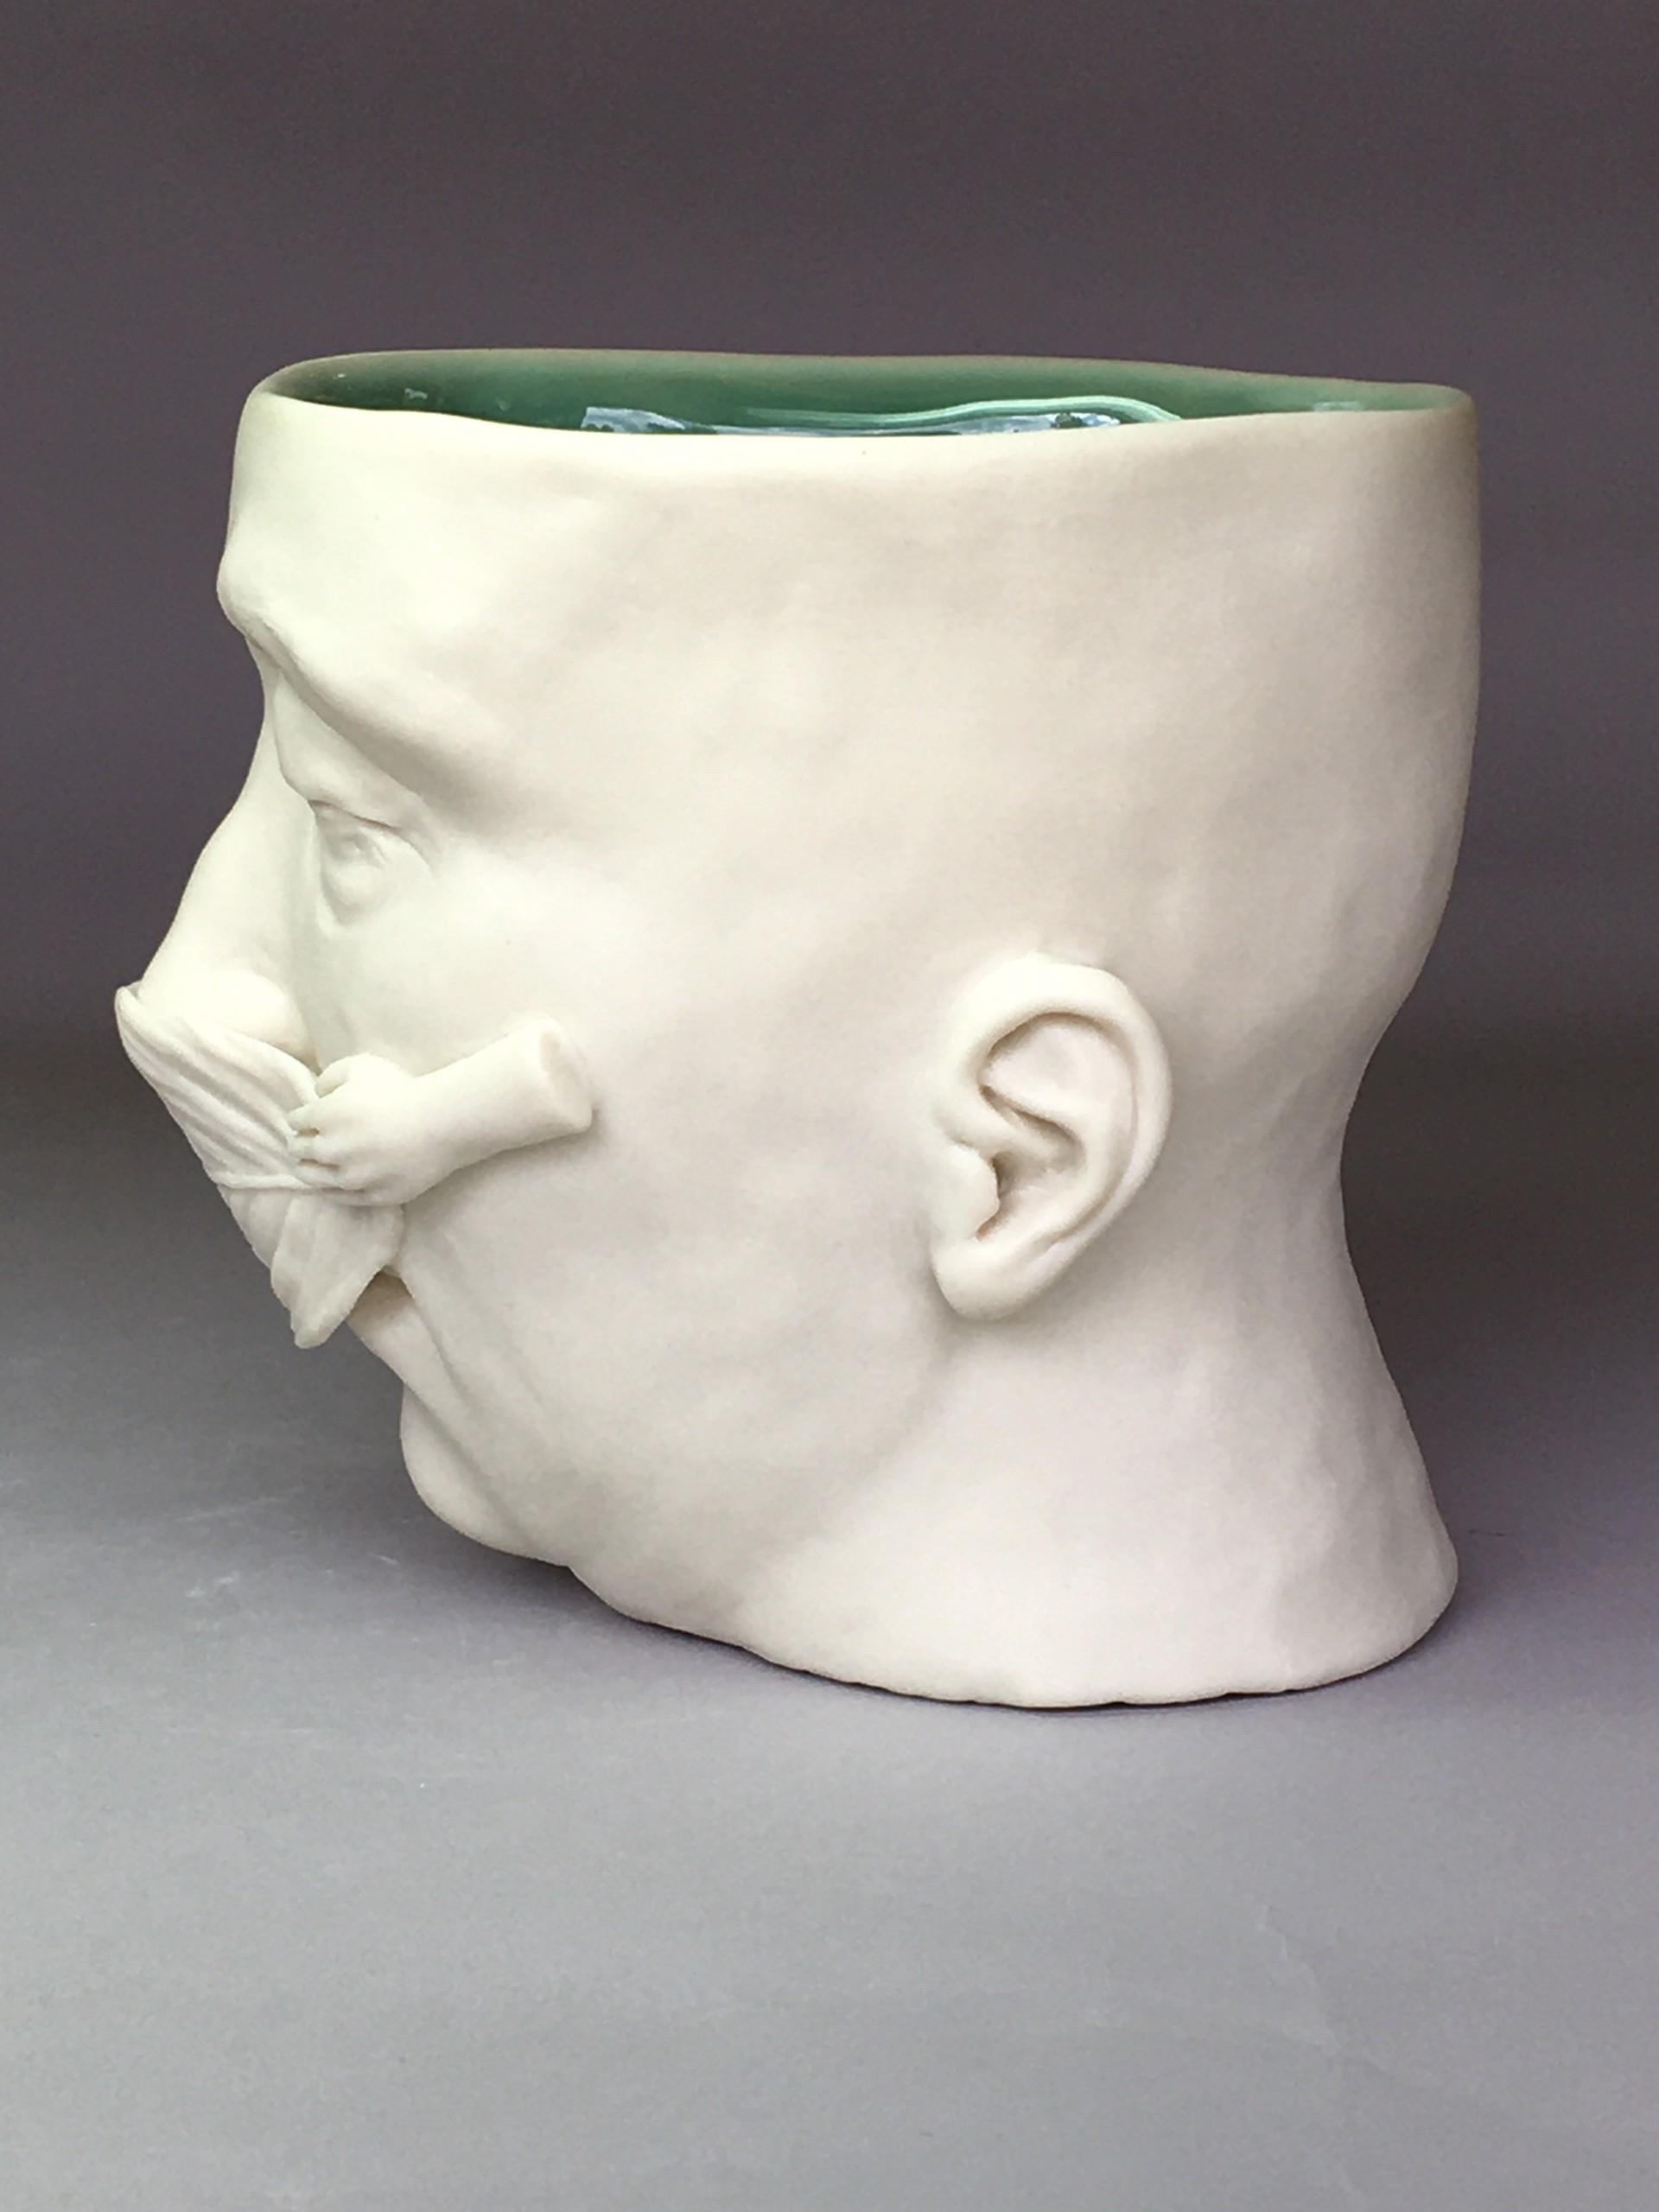 """Leaf Mask, Earth Day I, 2020"" (Large, eyes closed) by Adrian Arleo"